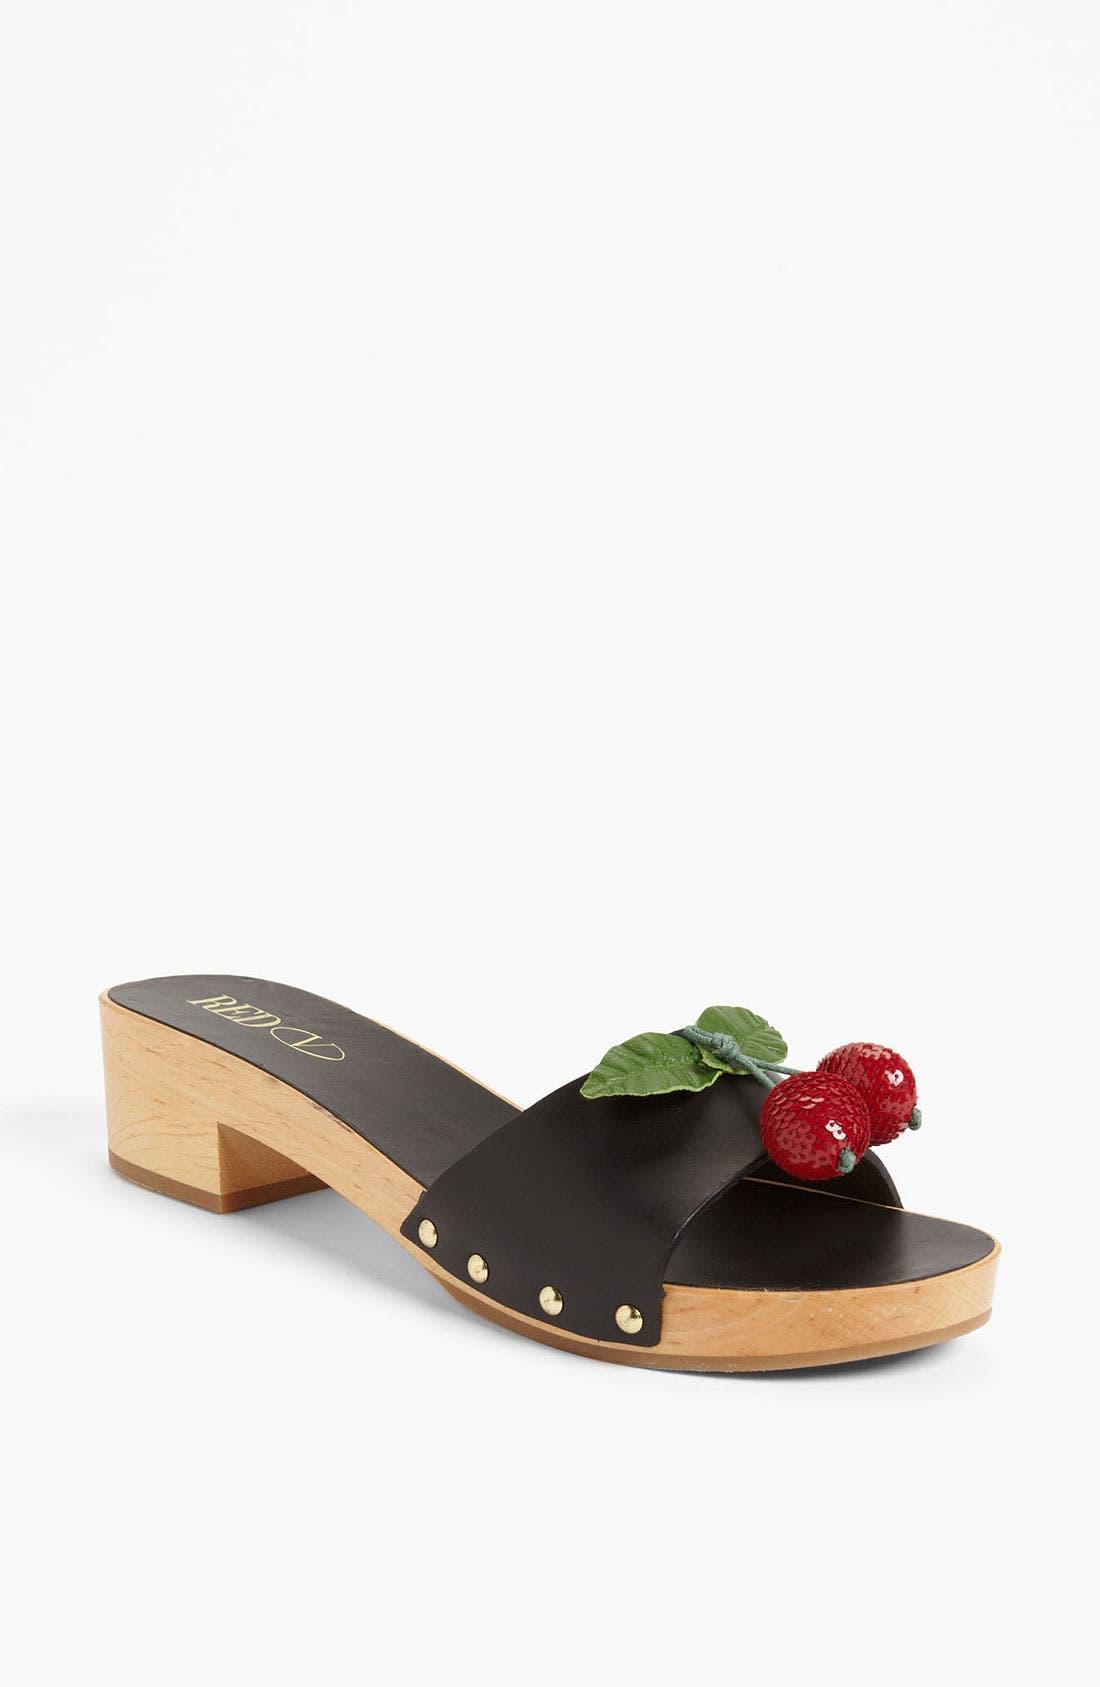 Alternate Image 1 Selected - RED Valentino 'Cherry' Sandal